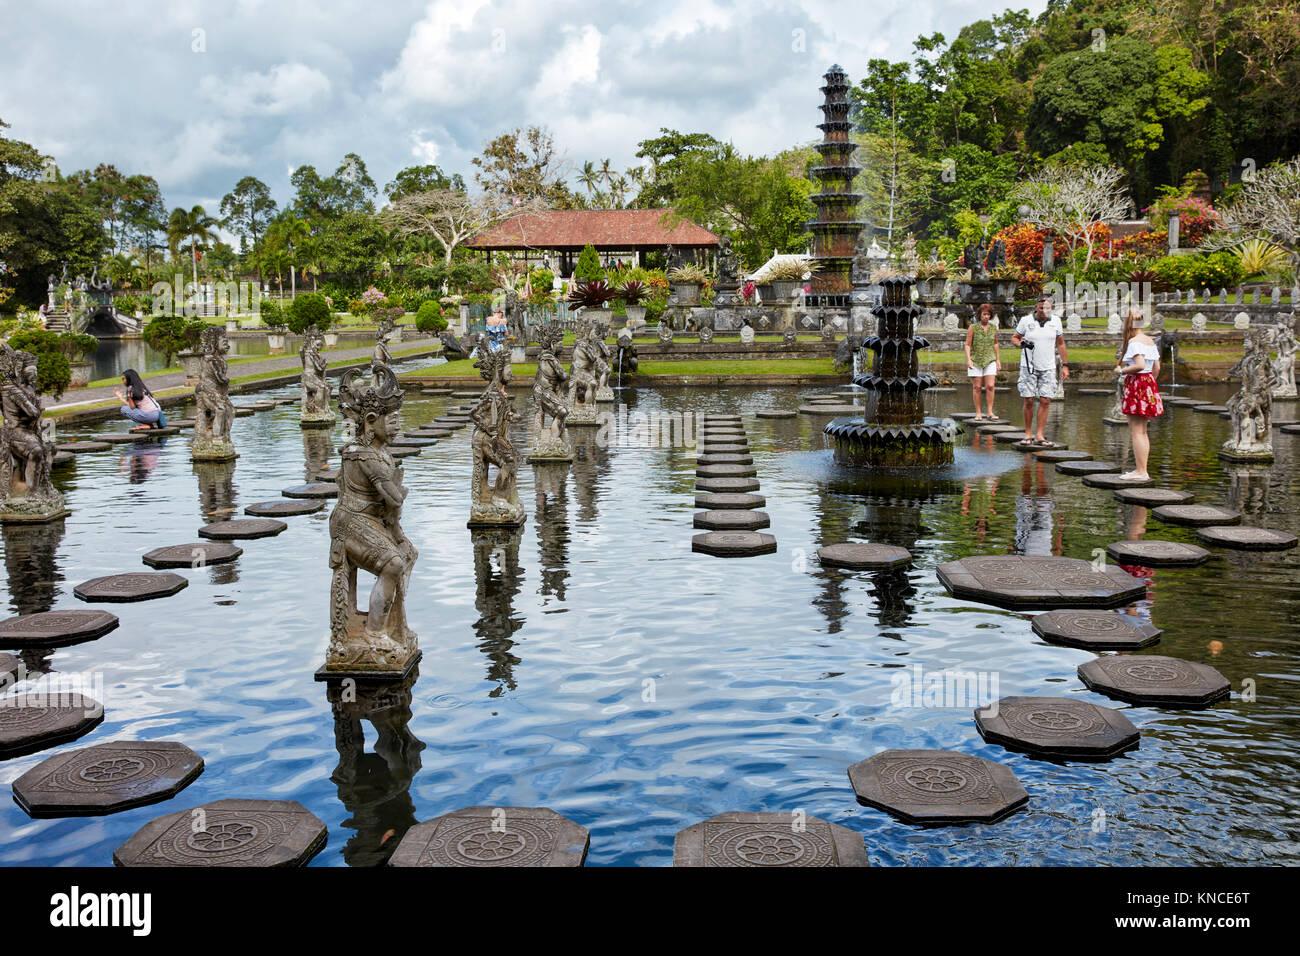 Tirta Gangga water palace, a former royal palace. Karangasem regency, Bali, Indonesia. - Stock Image